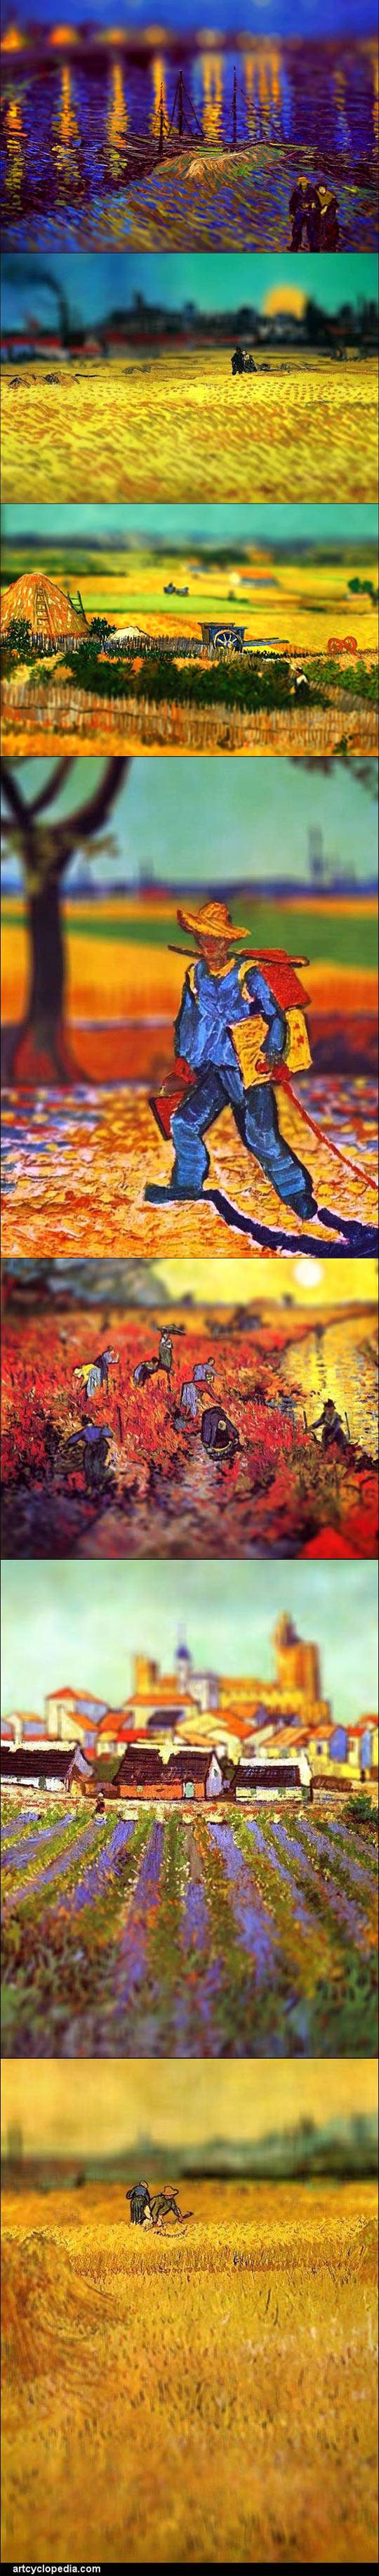 funny-Van-Gogh-shift-effect-painting-blur